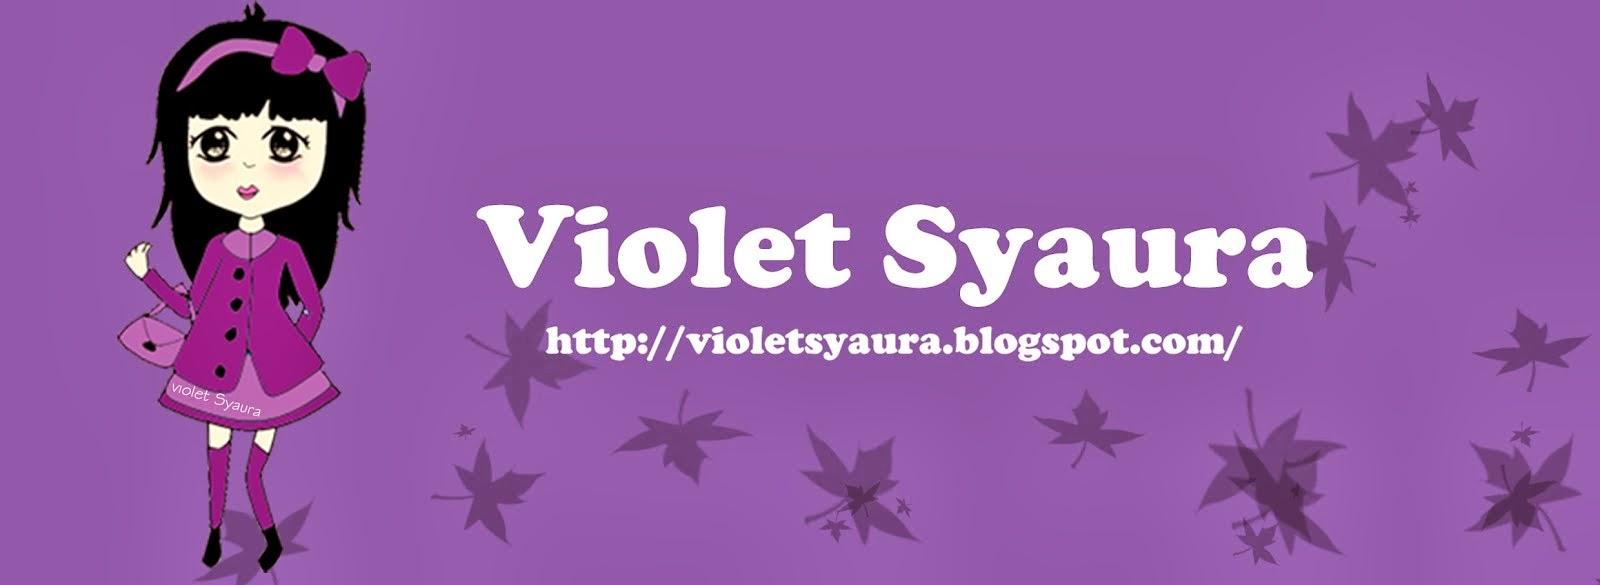 Violet Syaura